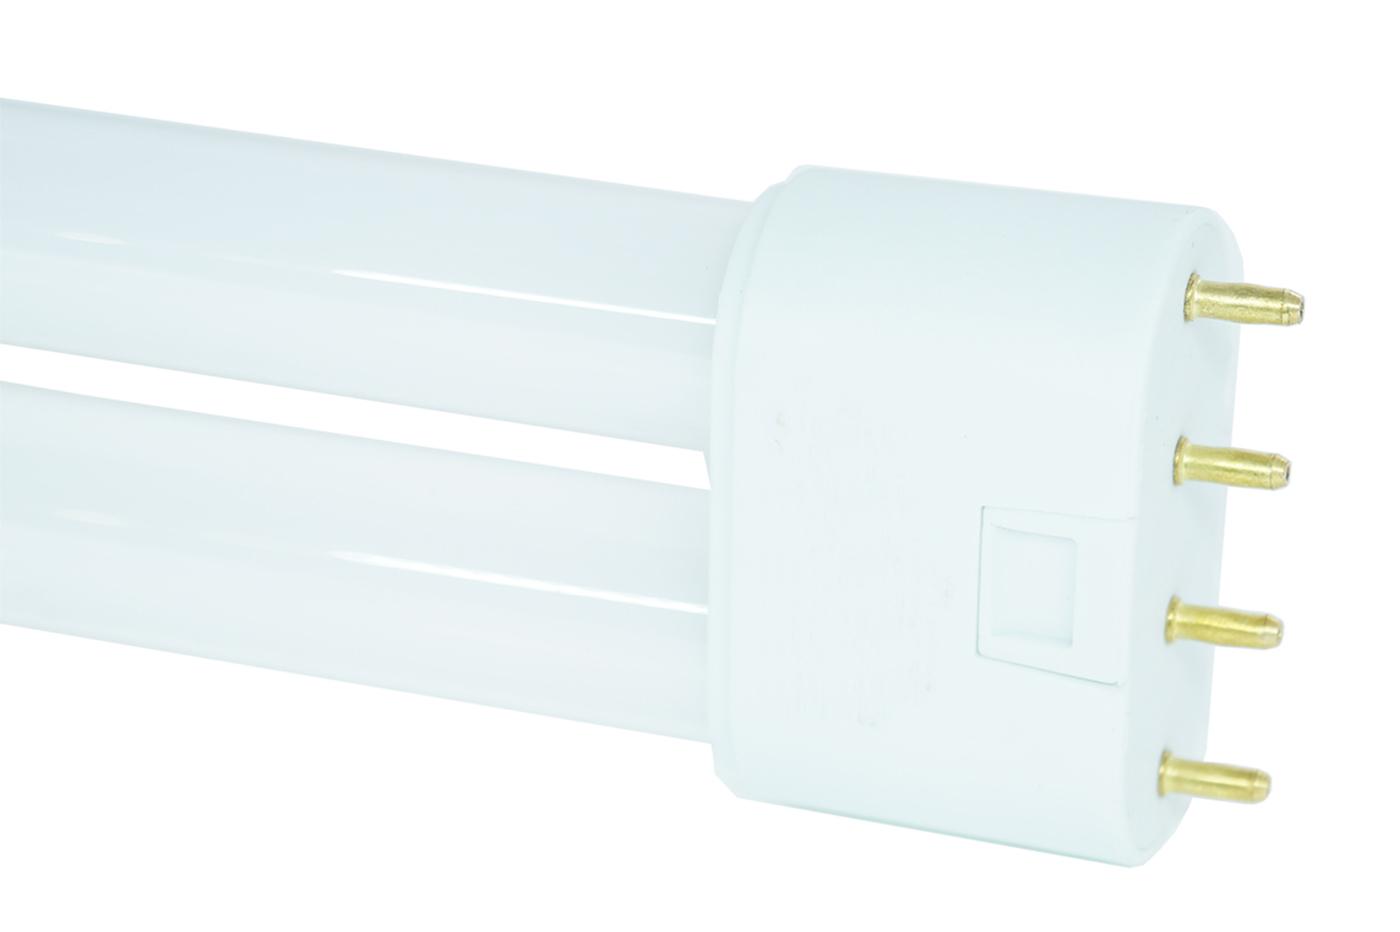 Plafoniere Neon 2x : Bes plafoniere beselettronica lampadina tubo